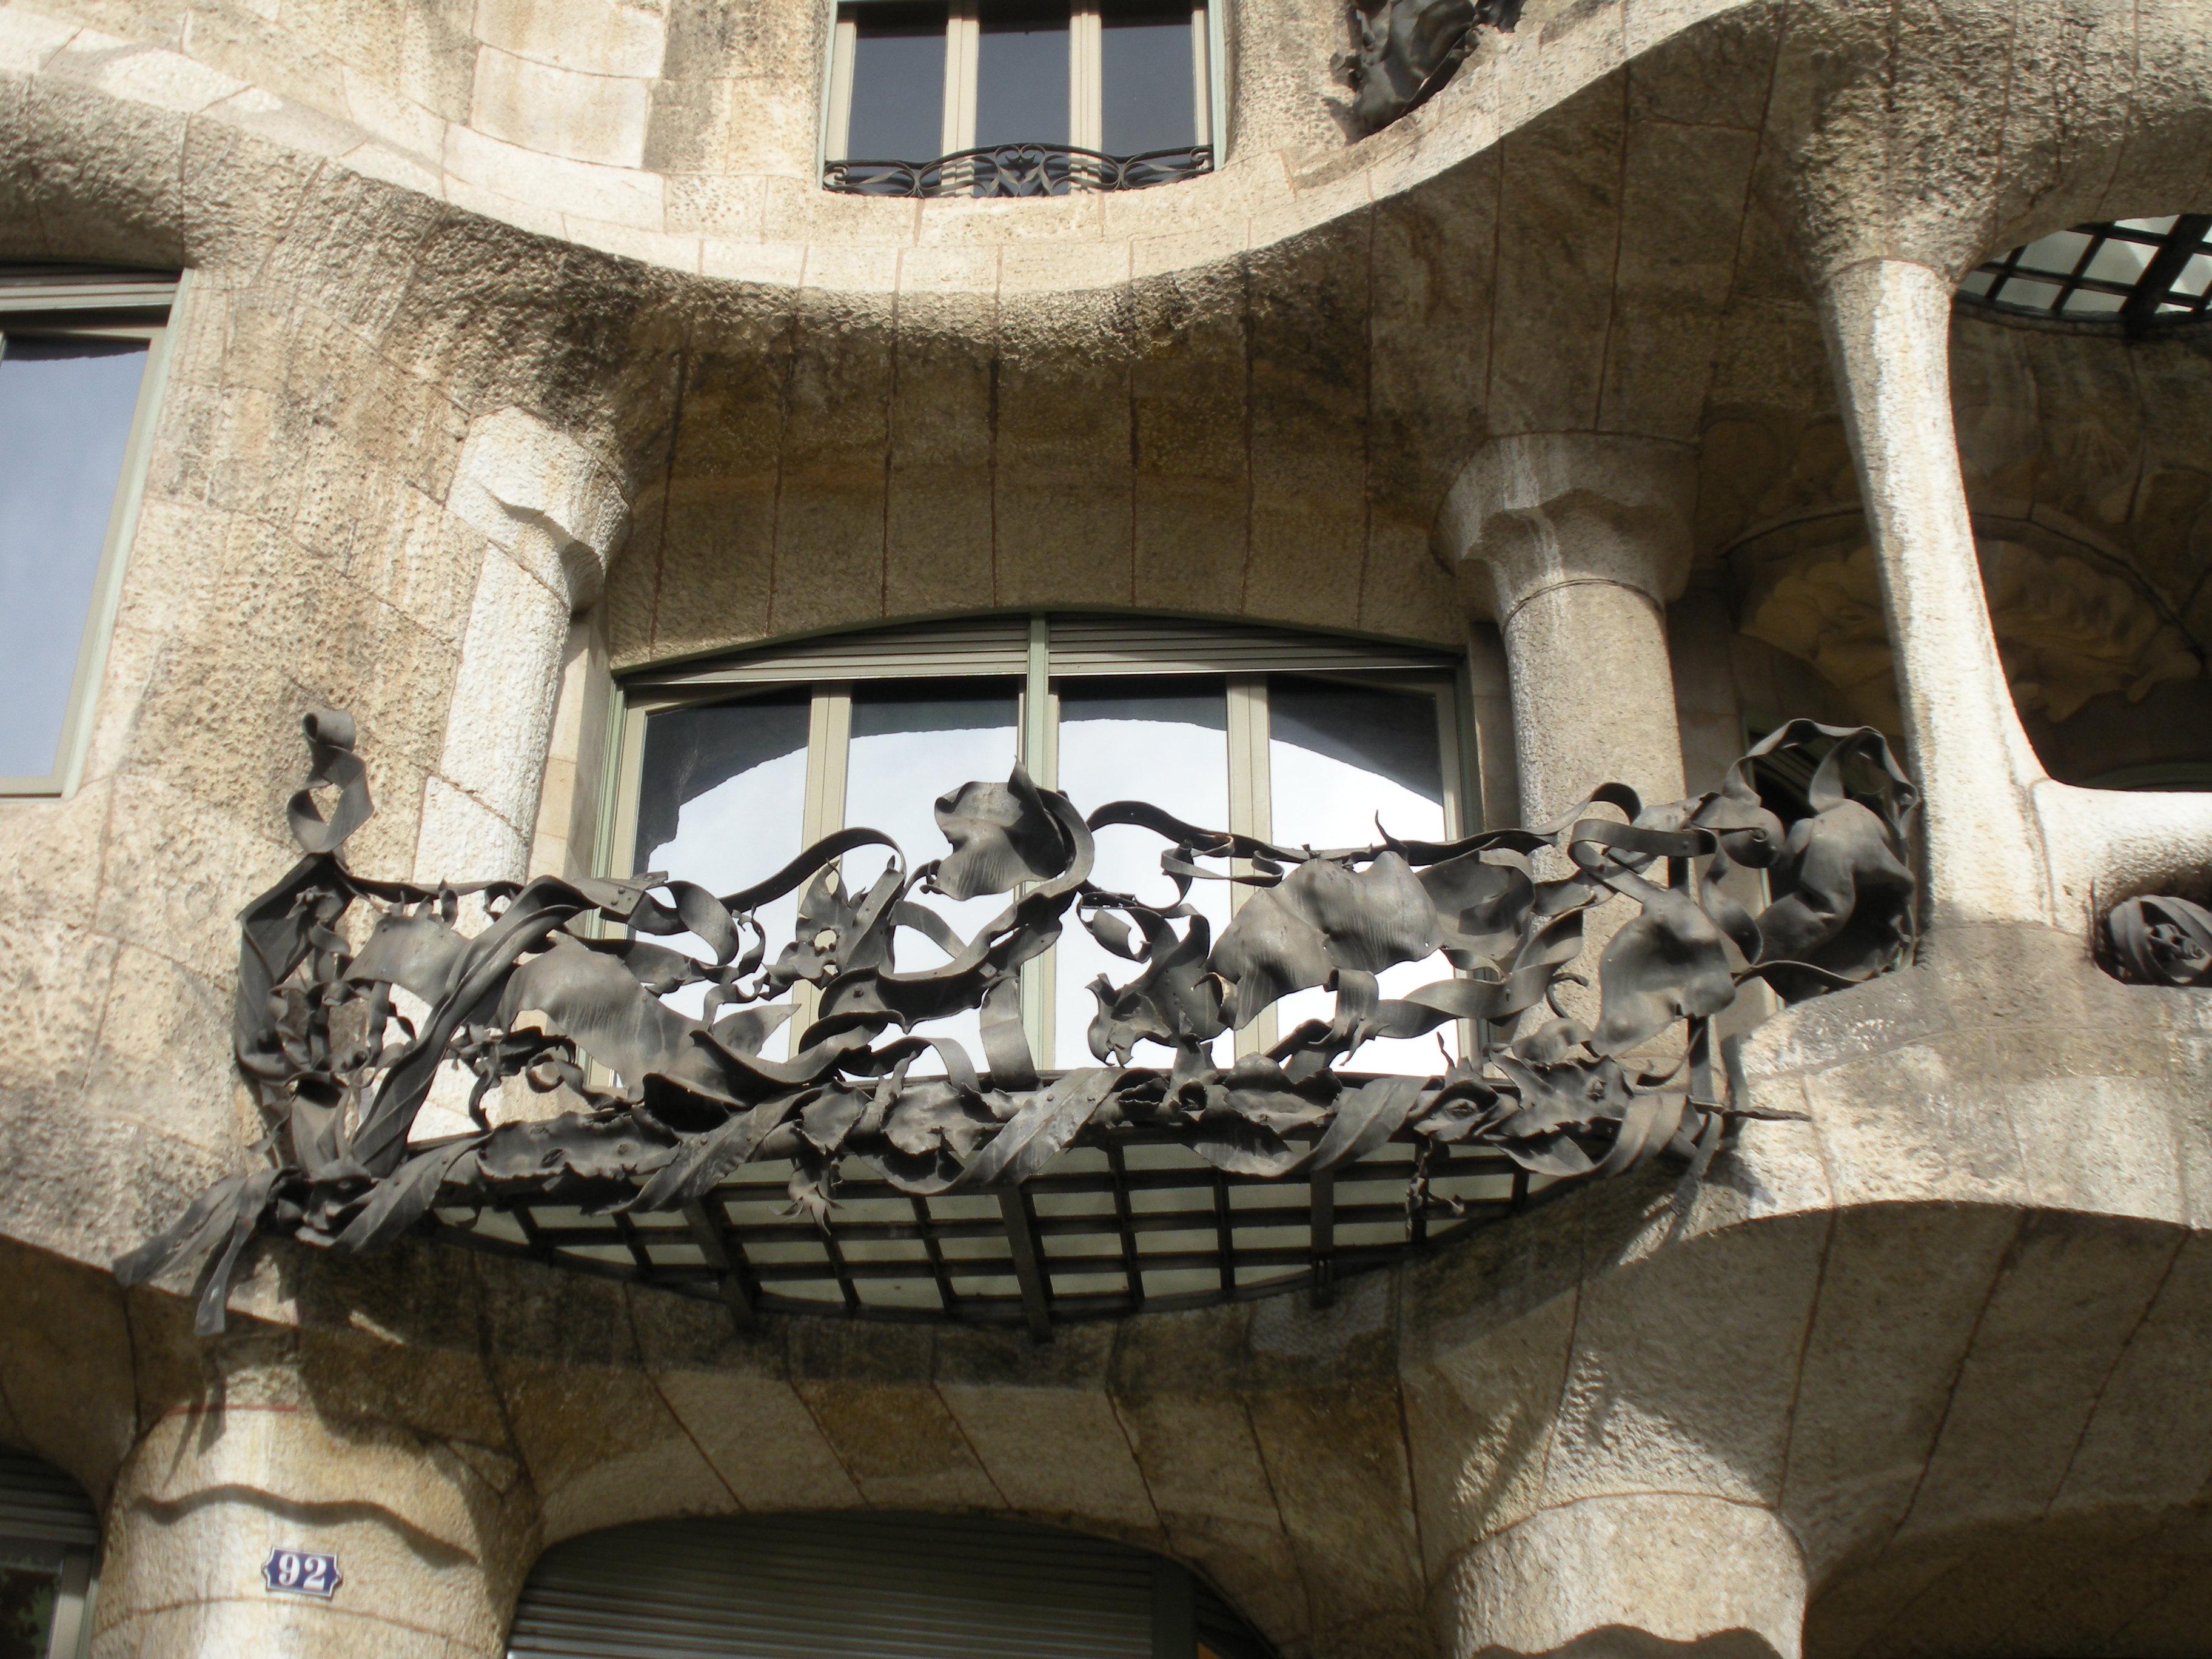 Casa_Mil%C3%A0_(Barcelona)_balcony.JPG